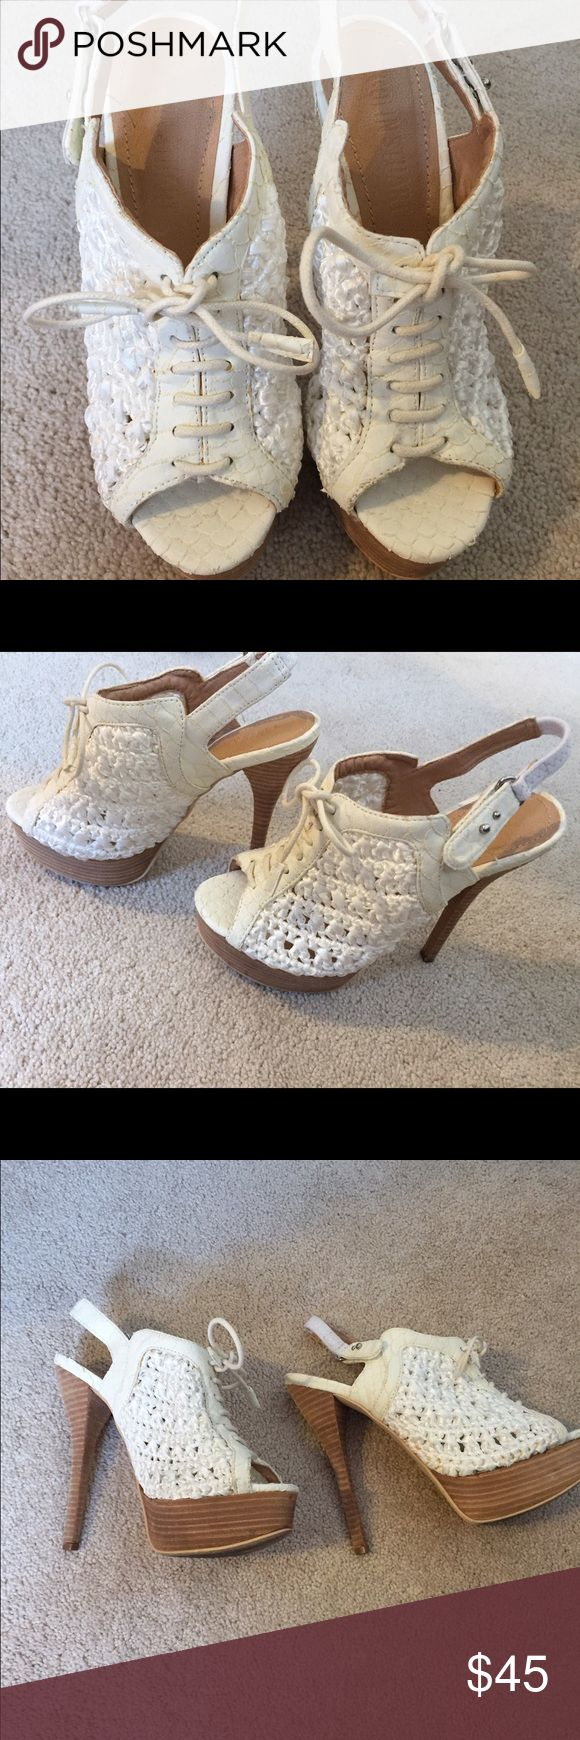 Colin Stuart crochet  heels Colin Stuart Cream crochet heels. Platform    Worn once.  Soooo cute for spring and summer!!!! Colin Stuart Shoes Wedges